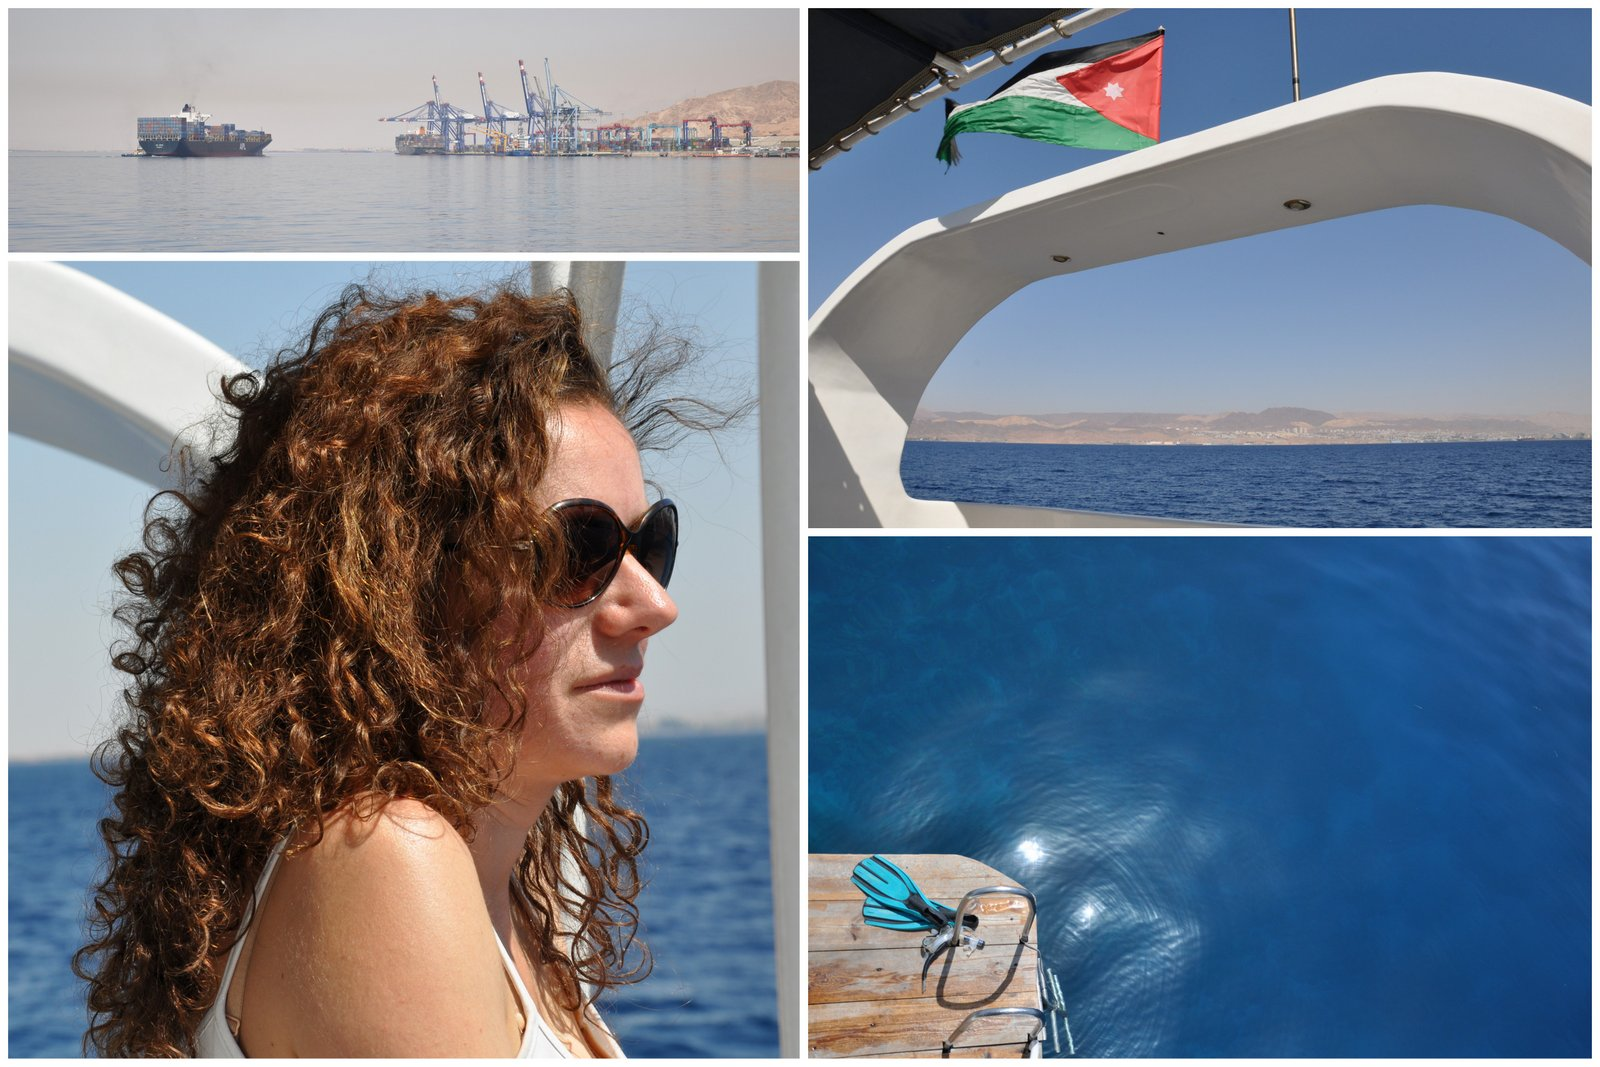 jordanie aqaba mer rouge